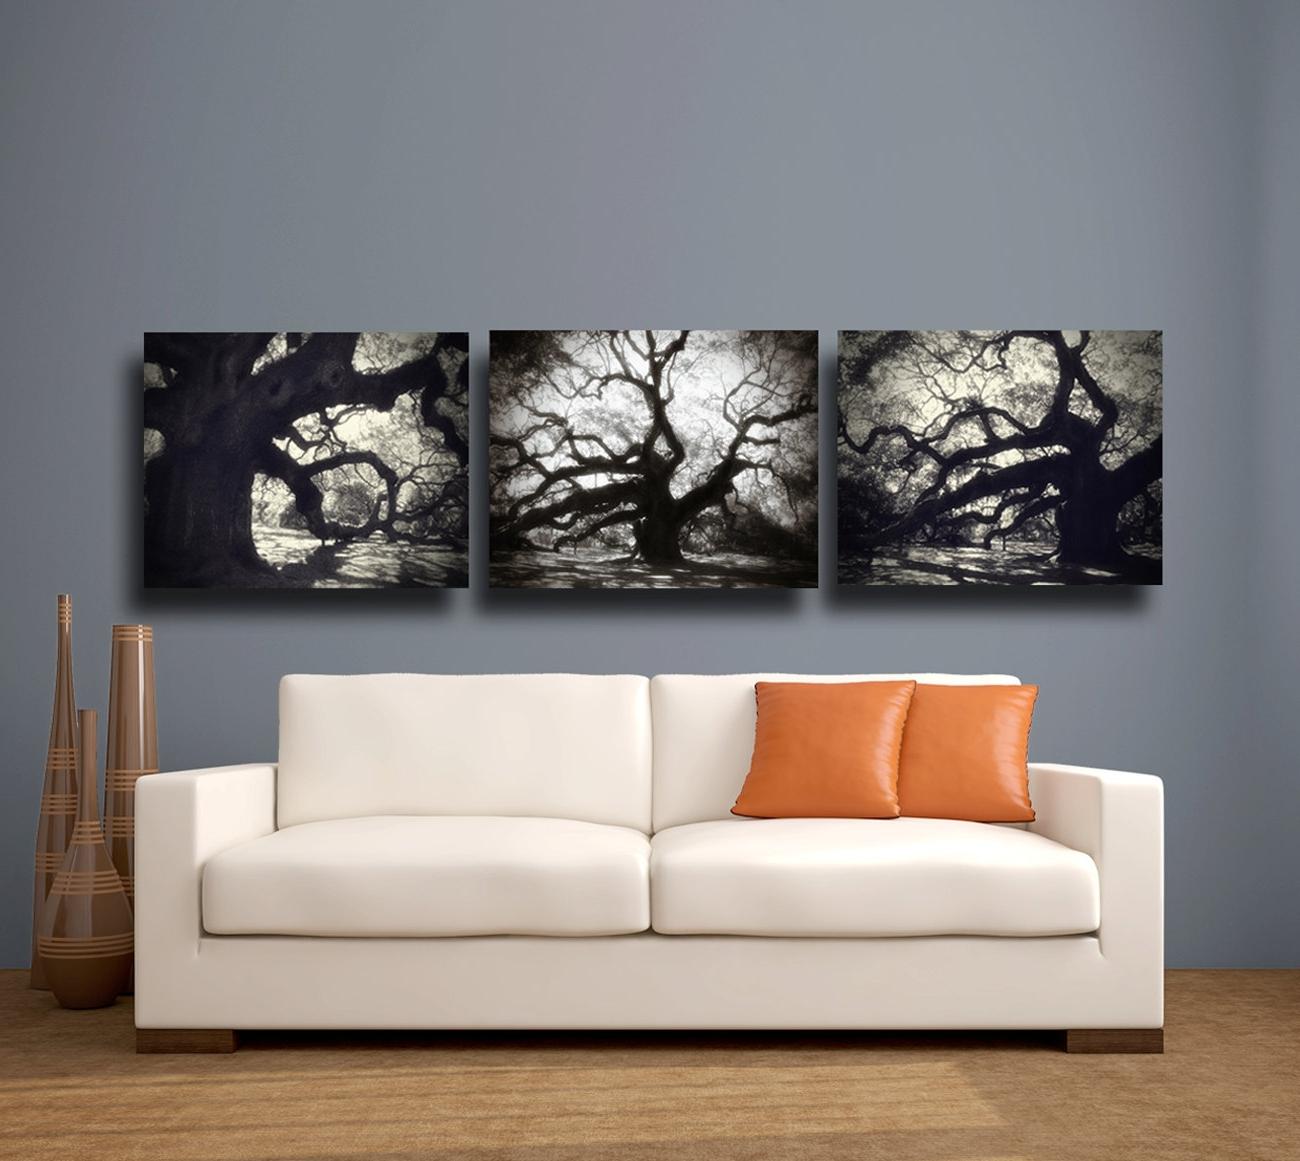 Living Room Canvas Wall Art Regarding Favorite Living Room : Big Canvas Simple Painting Living Room Canvas Wall (Gallery 6 of 15)